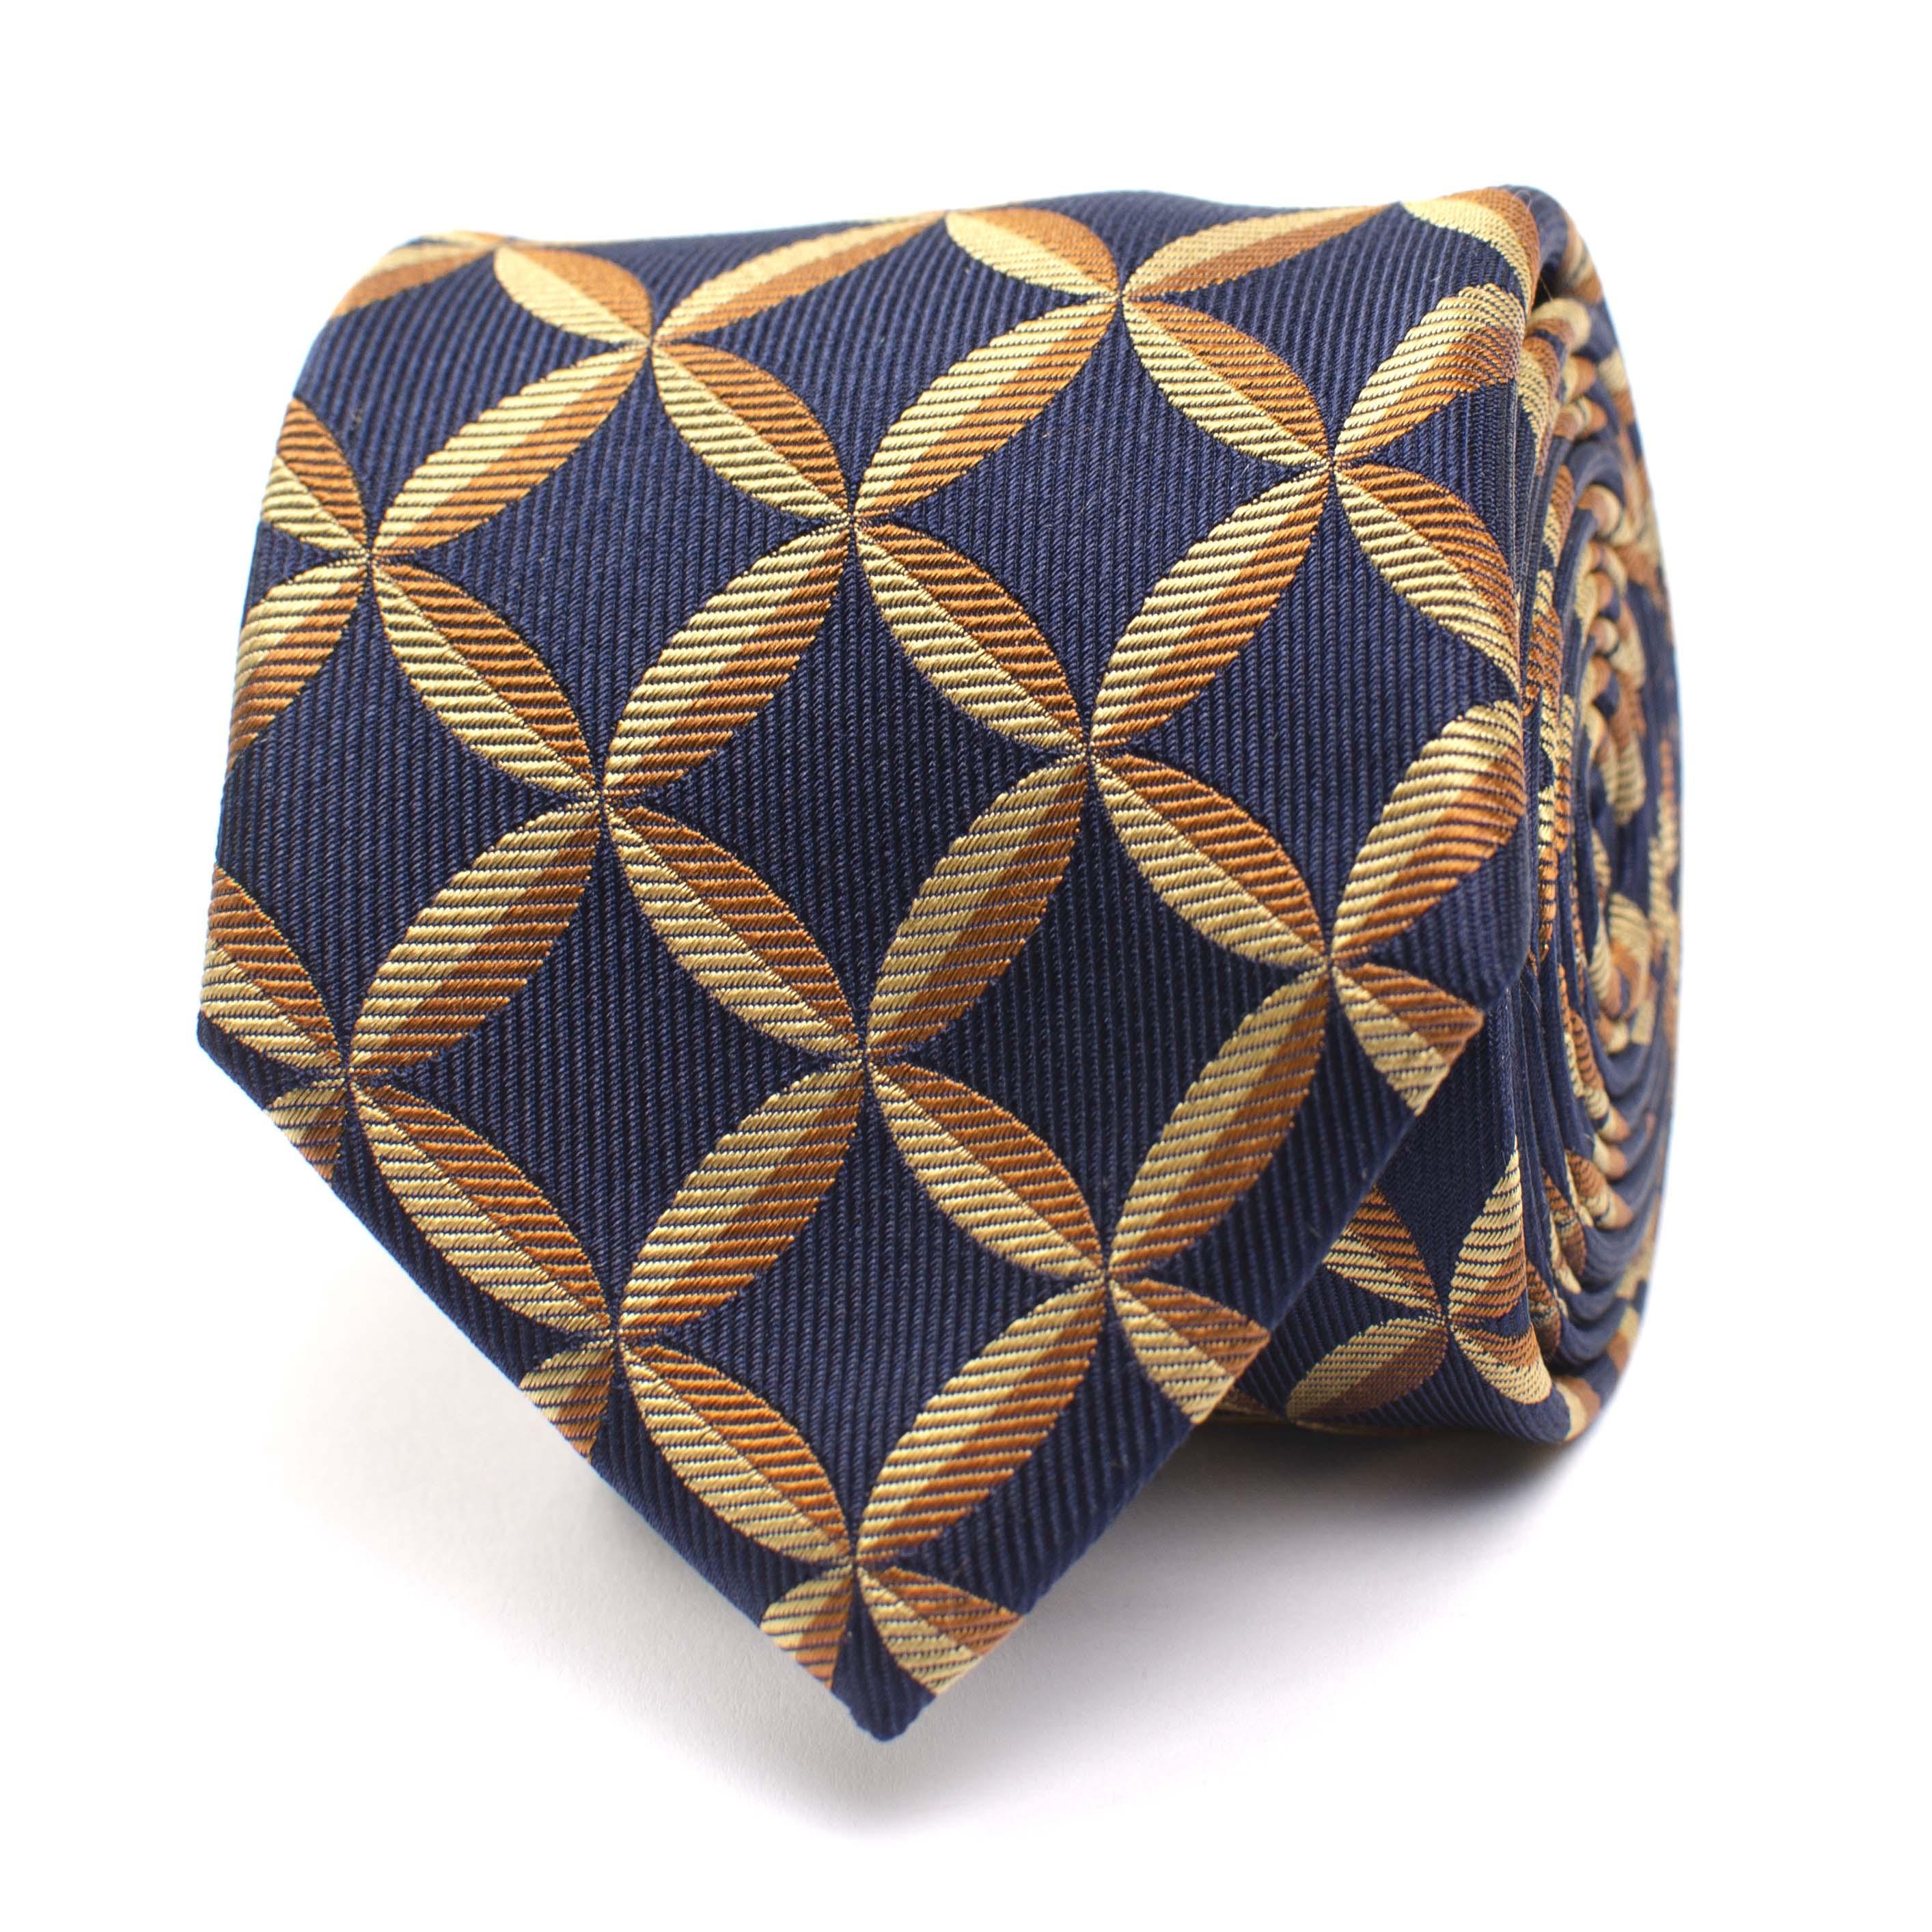 Jaxen | Silk tie with fanstasyprint